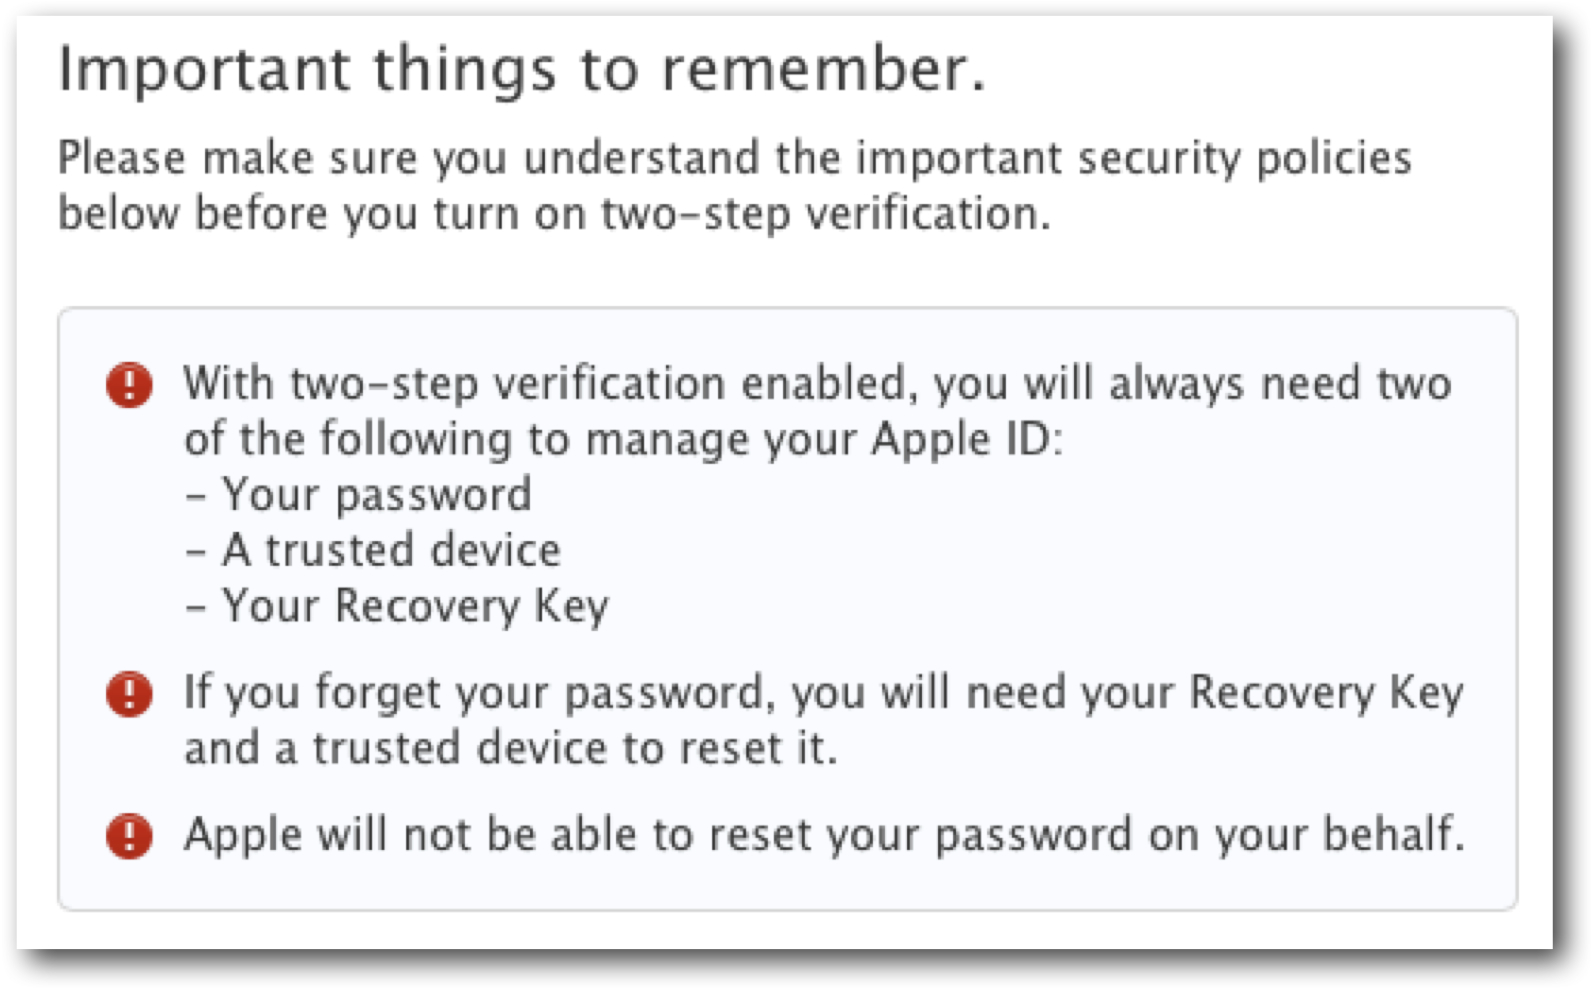 14-digit recovery key